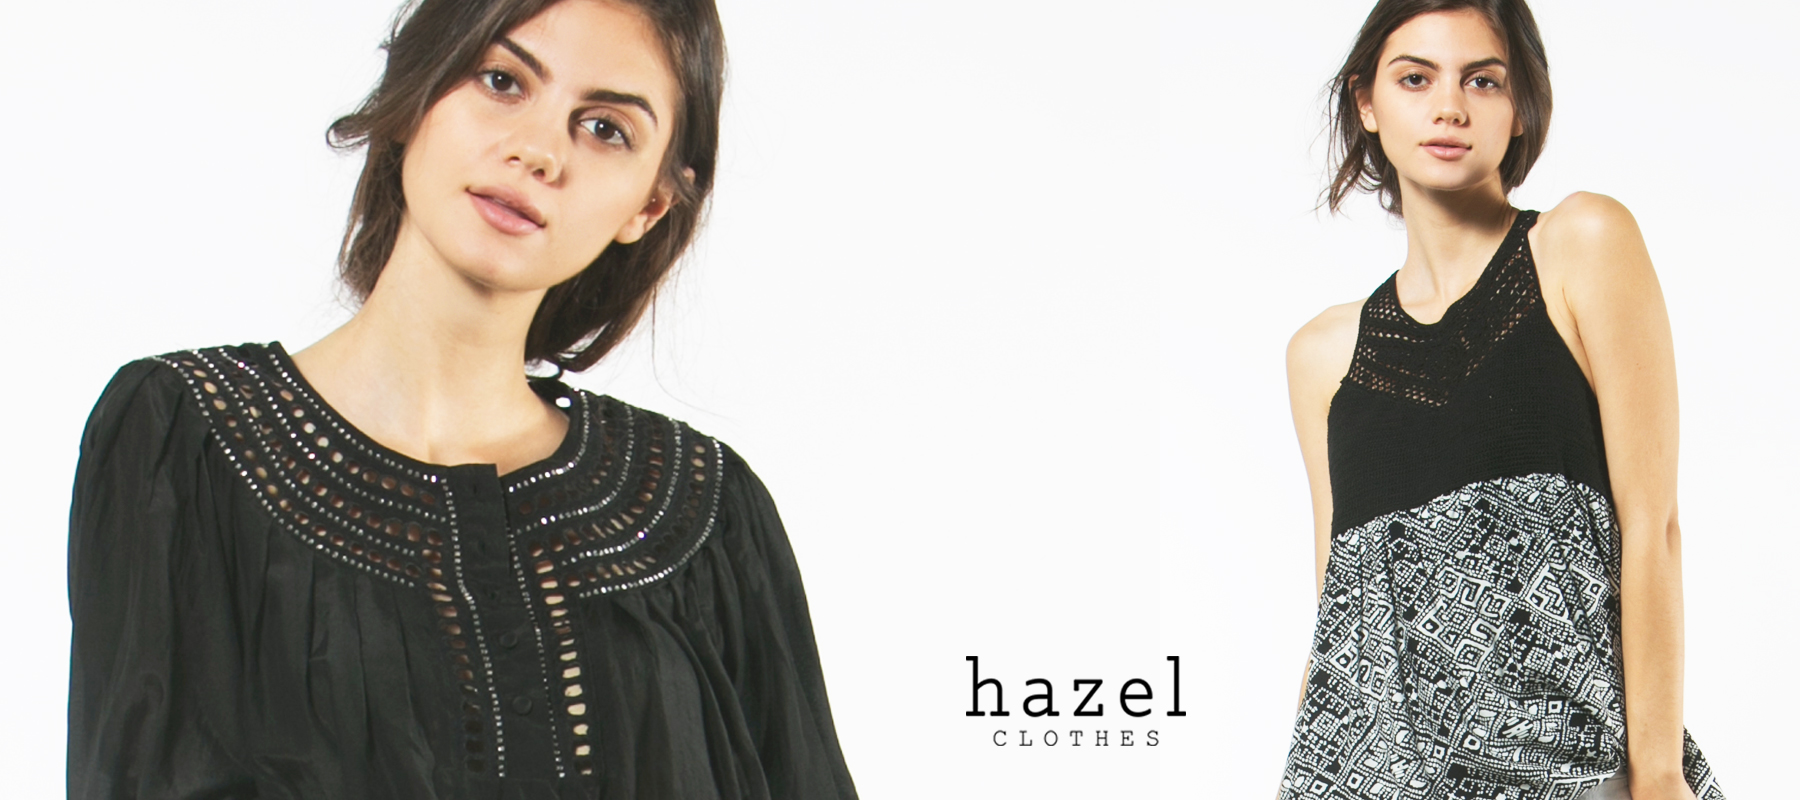 hazel clothes slide6